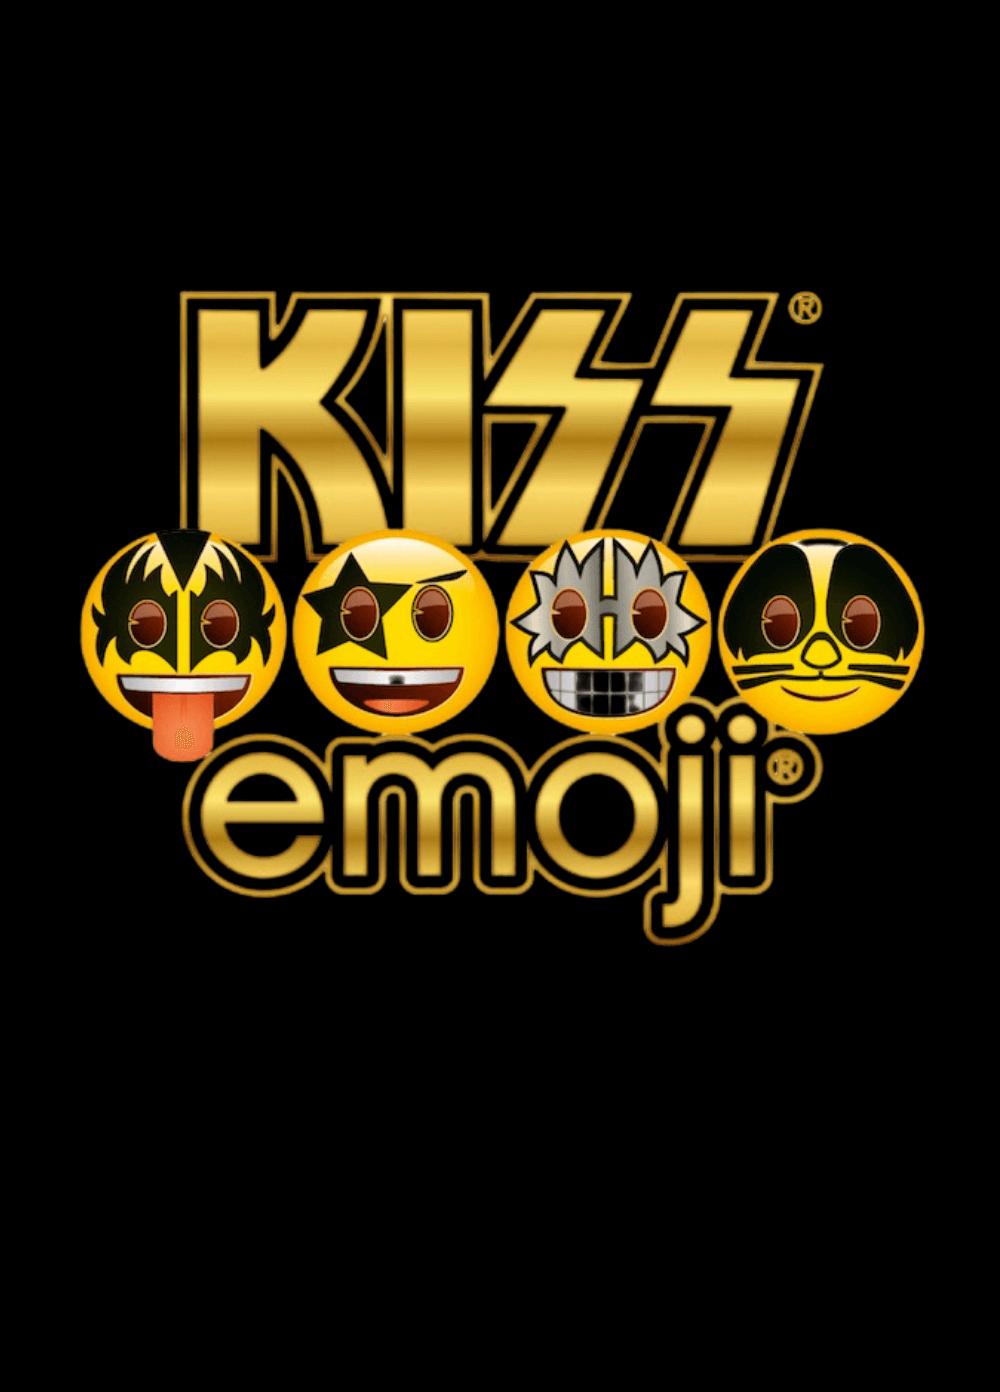 KISS® x emoji® – A Powerful Brand Collaboration!